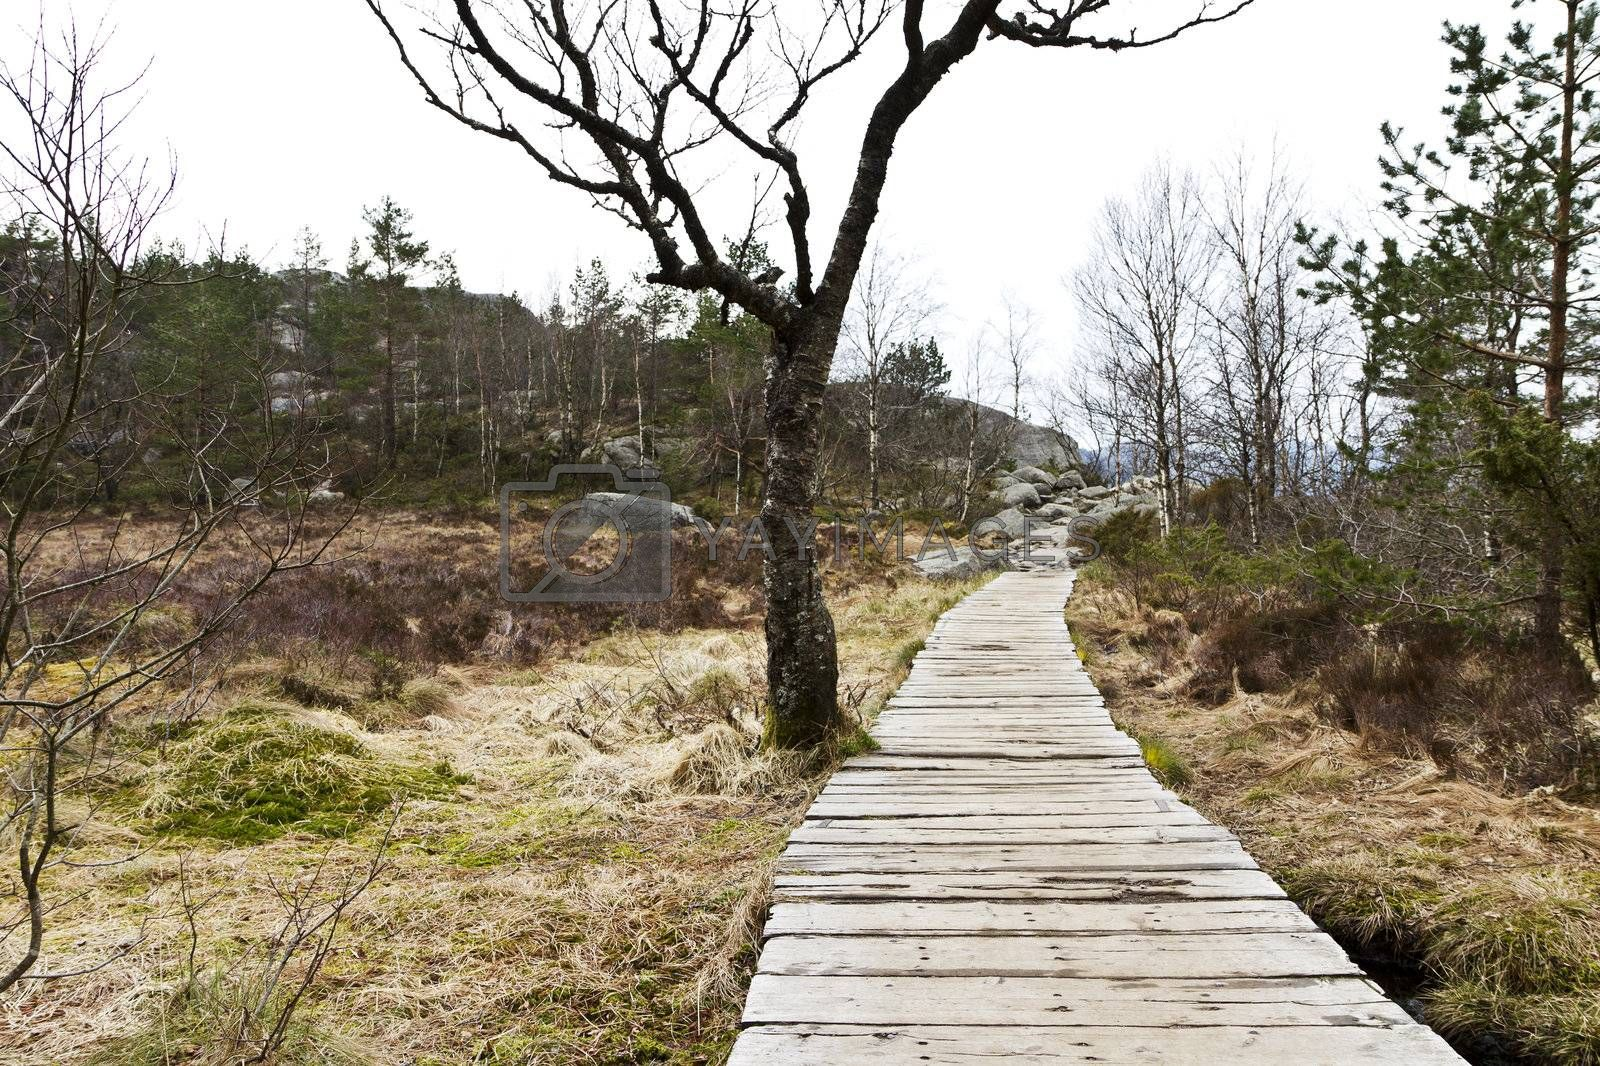 wooden foot path in rural landscape in norway